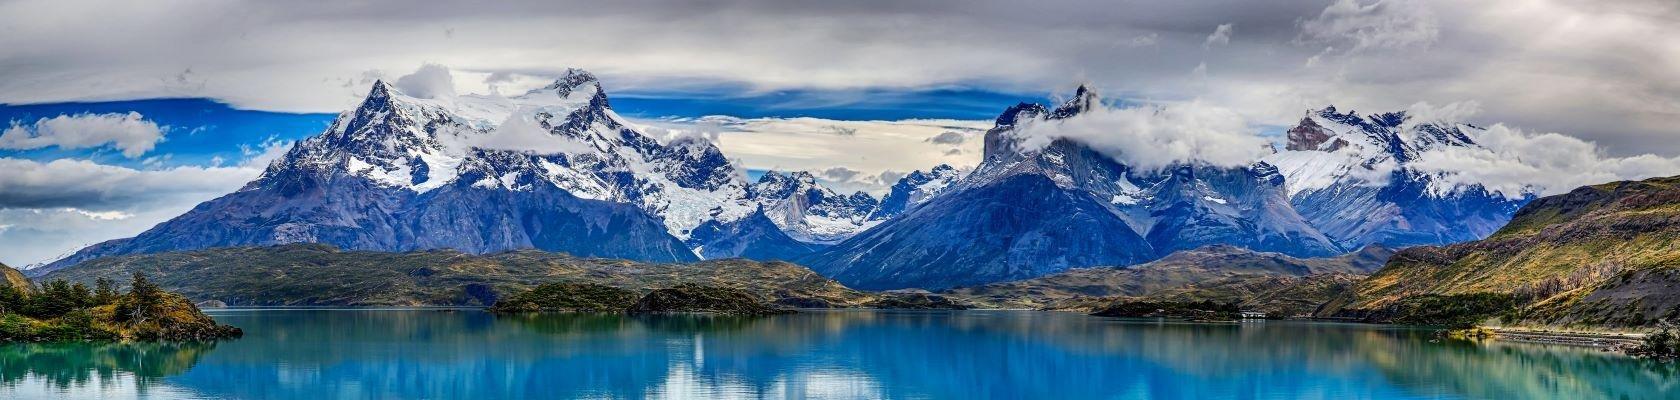 Vaargebied Zuid Amerika & Antartica